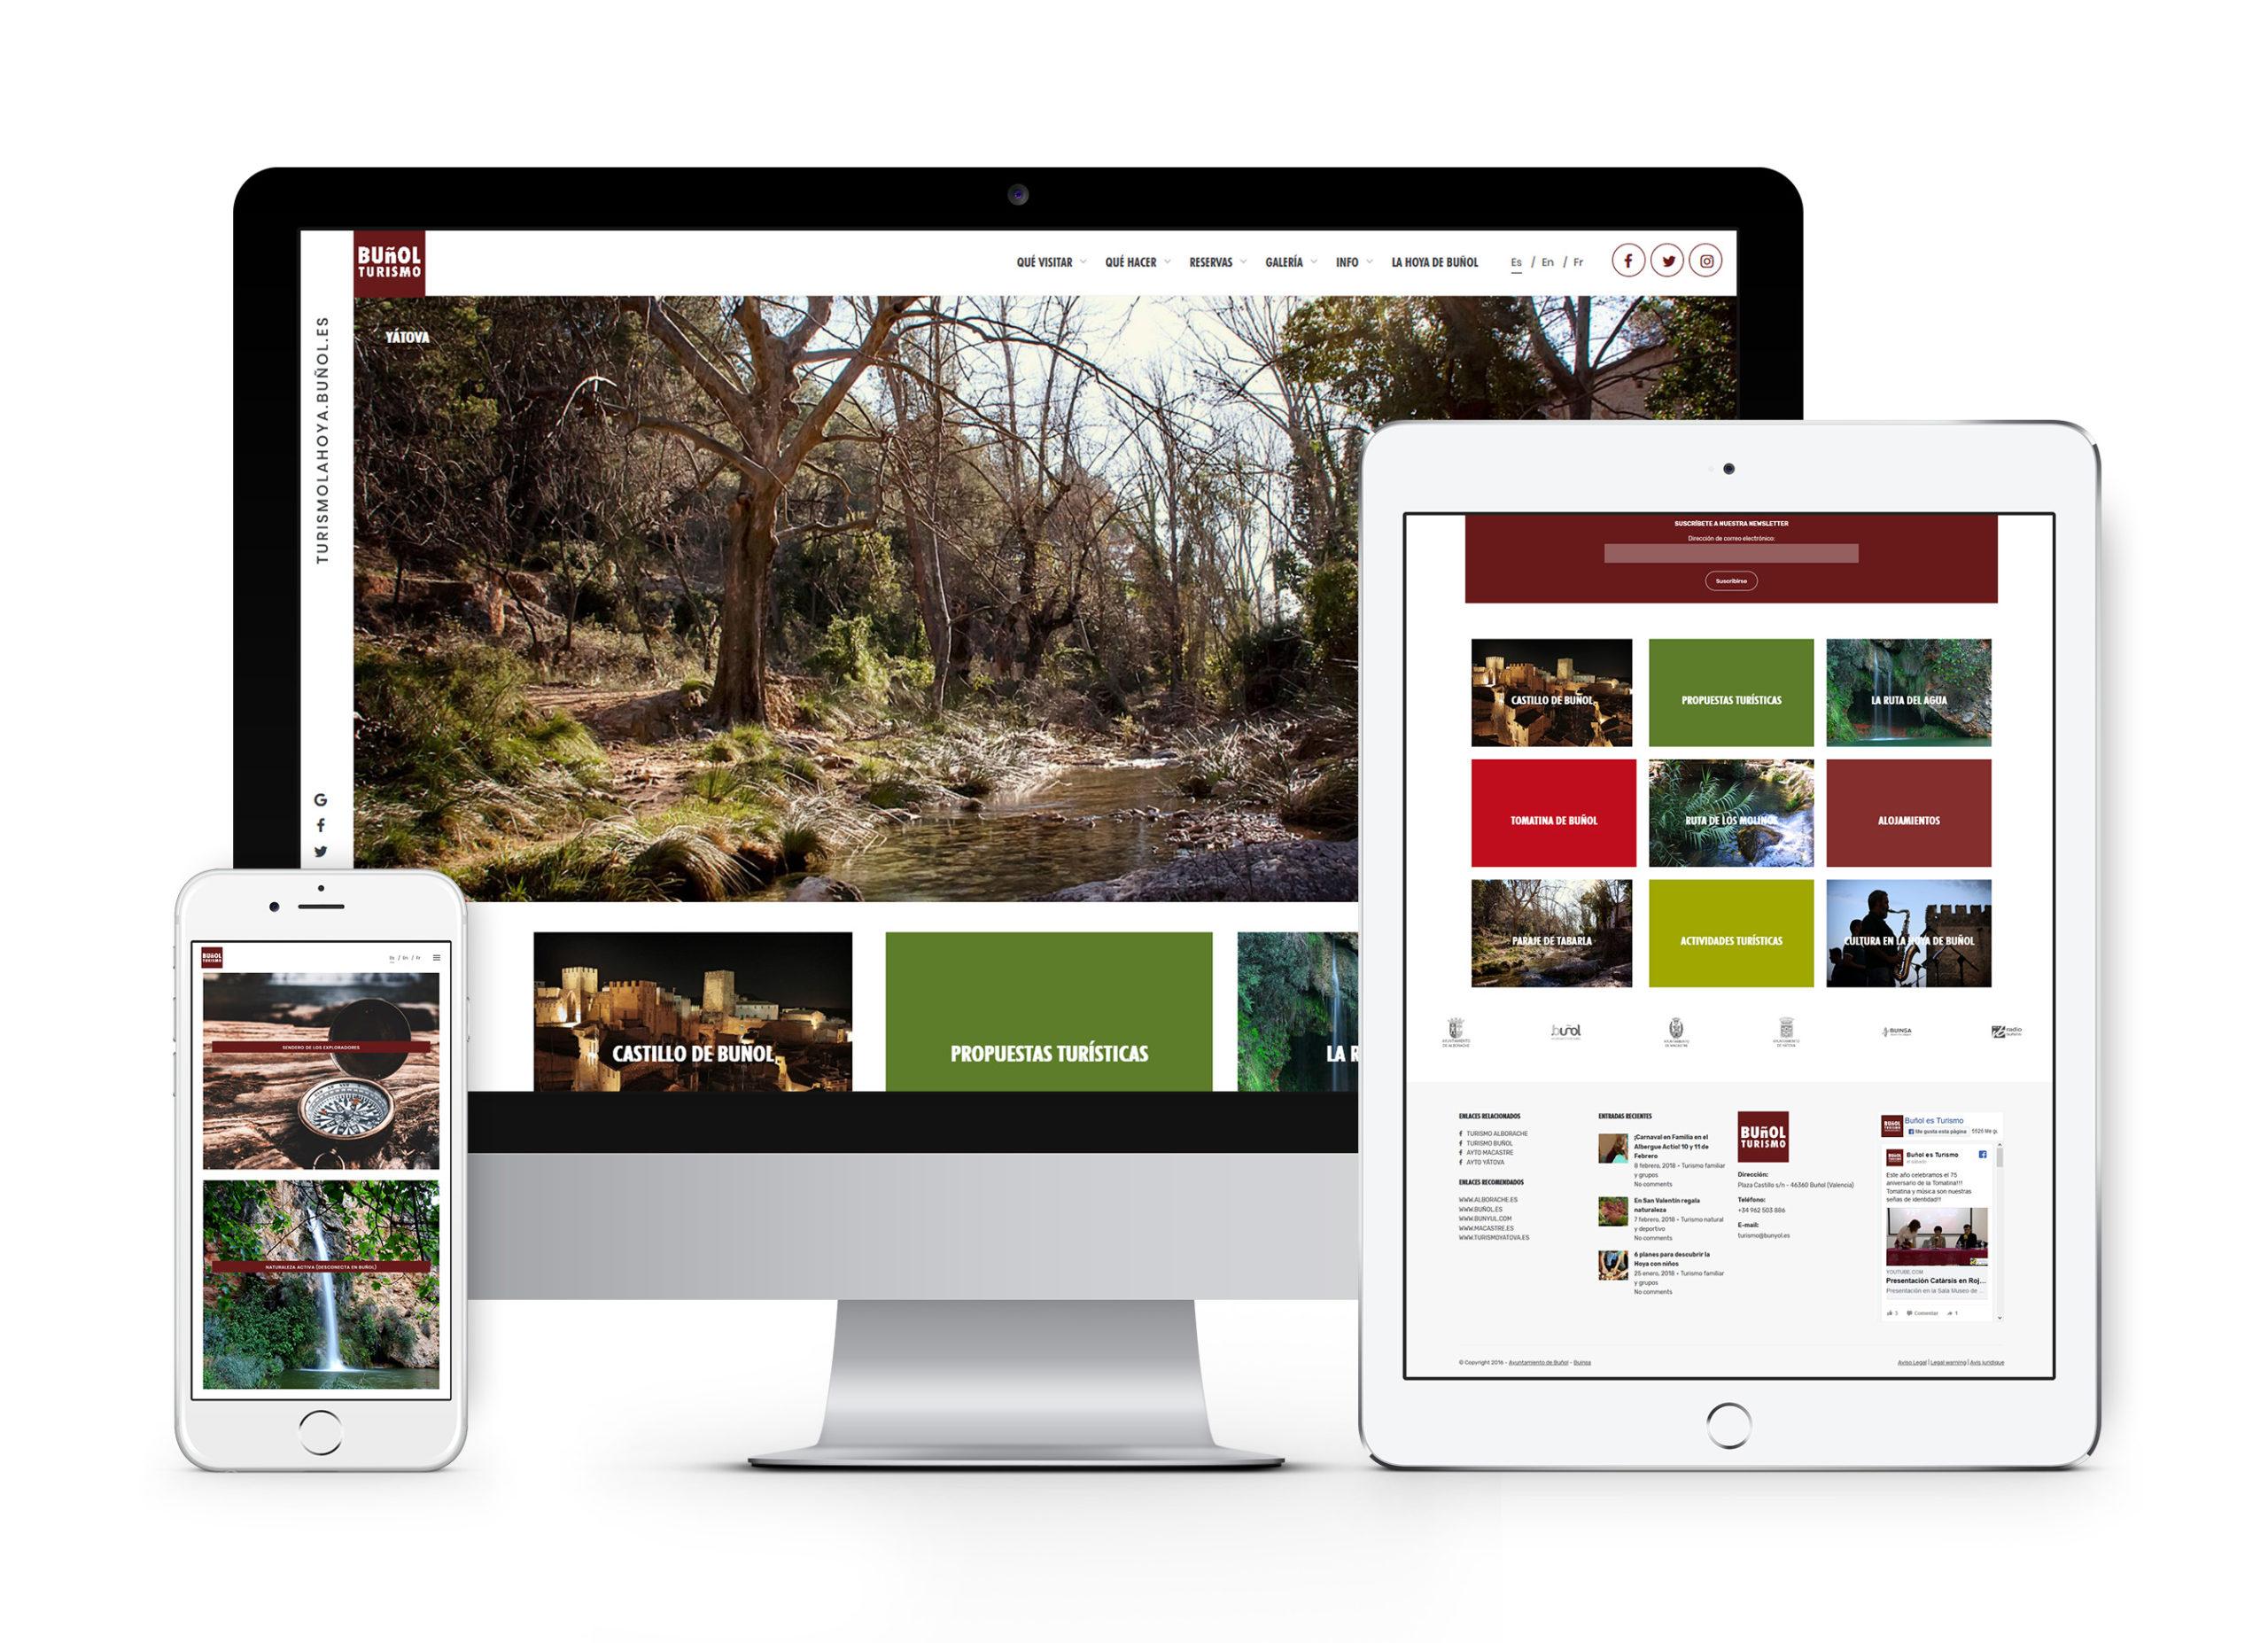 Buñol Turismo - Diseño web